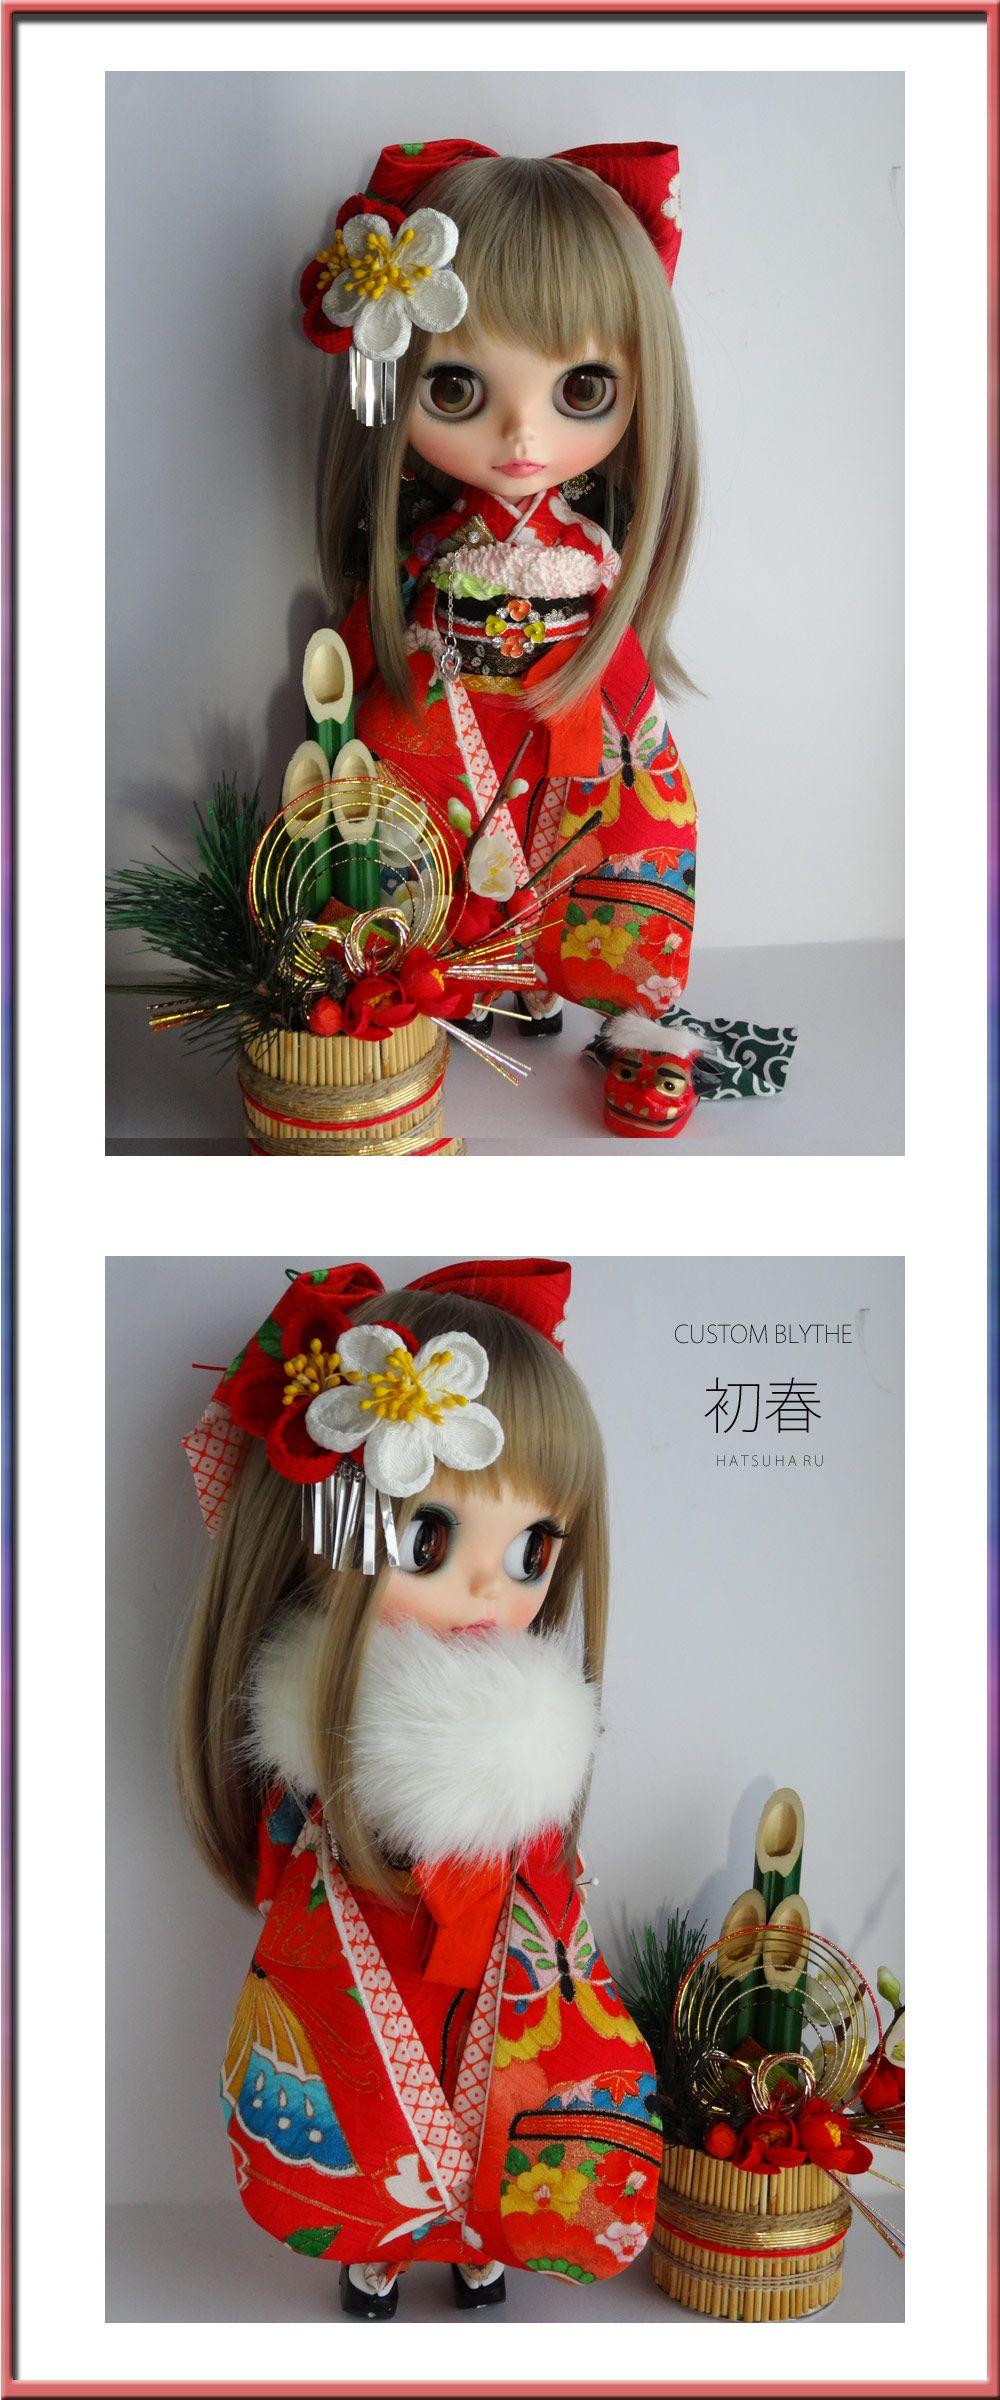 Kyohiroカスタムブライス☆正絹赤地友禅柄の振袖☆初春♪ - ヤフオク!